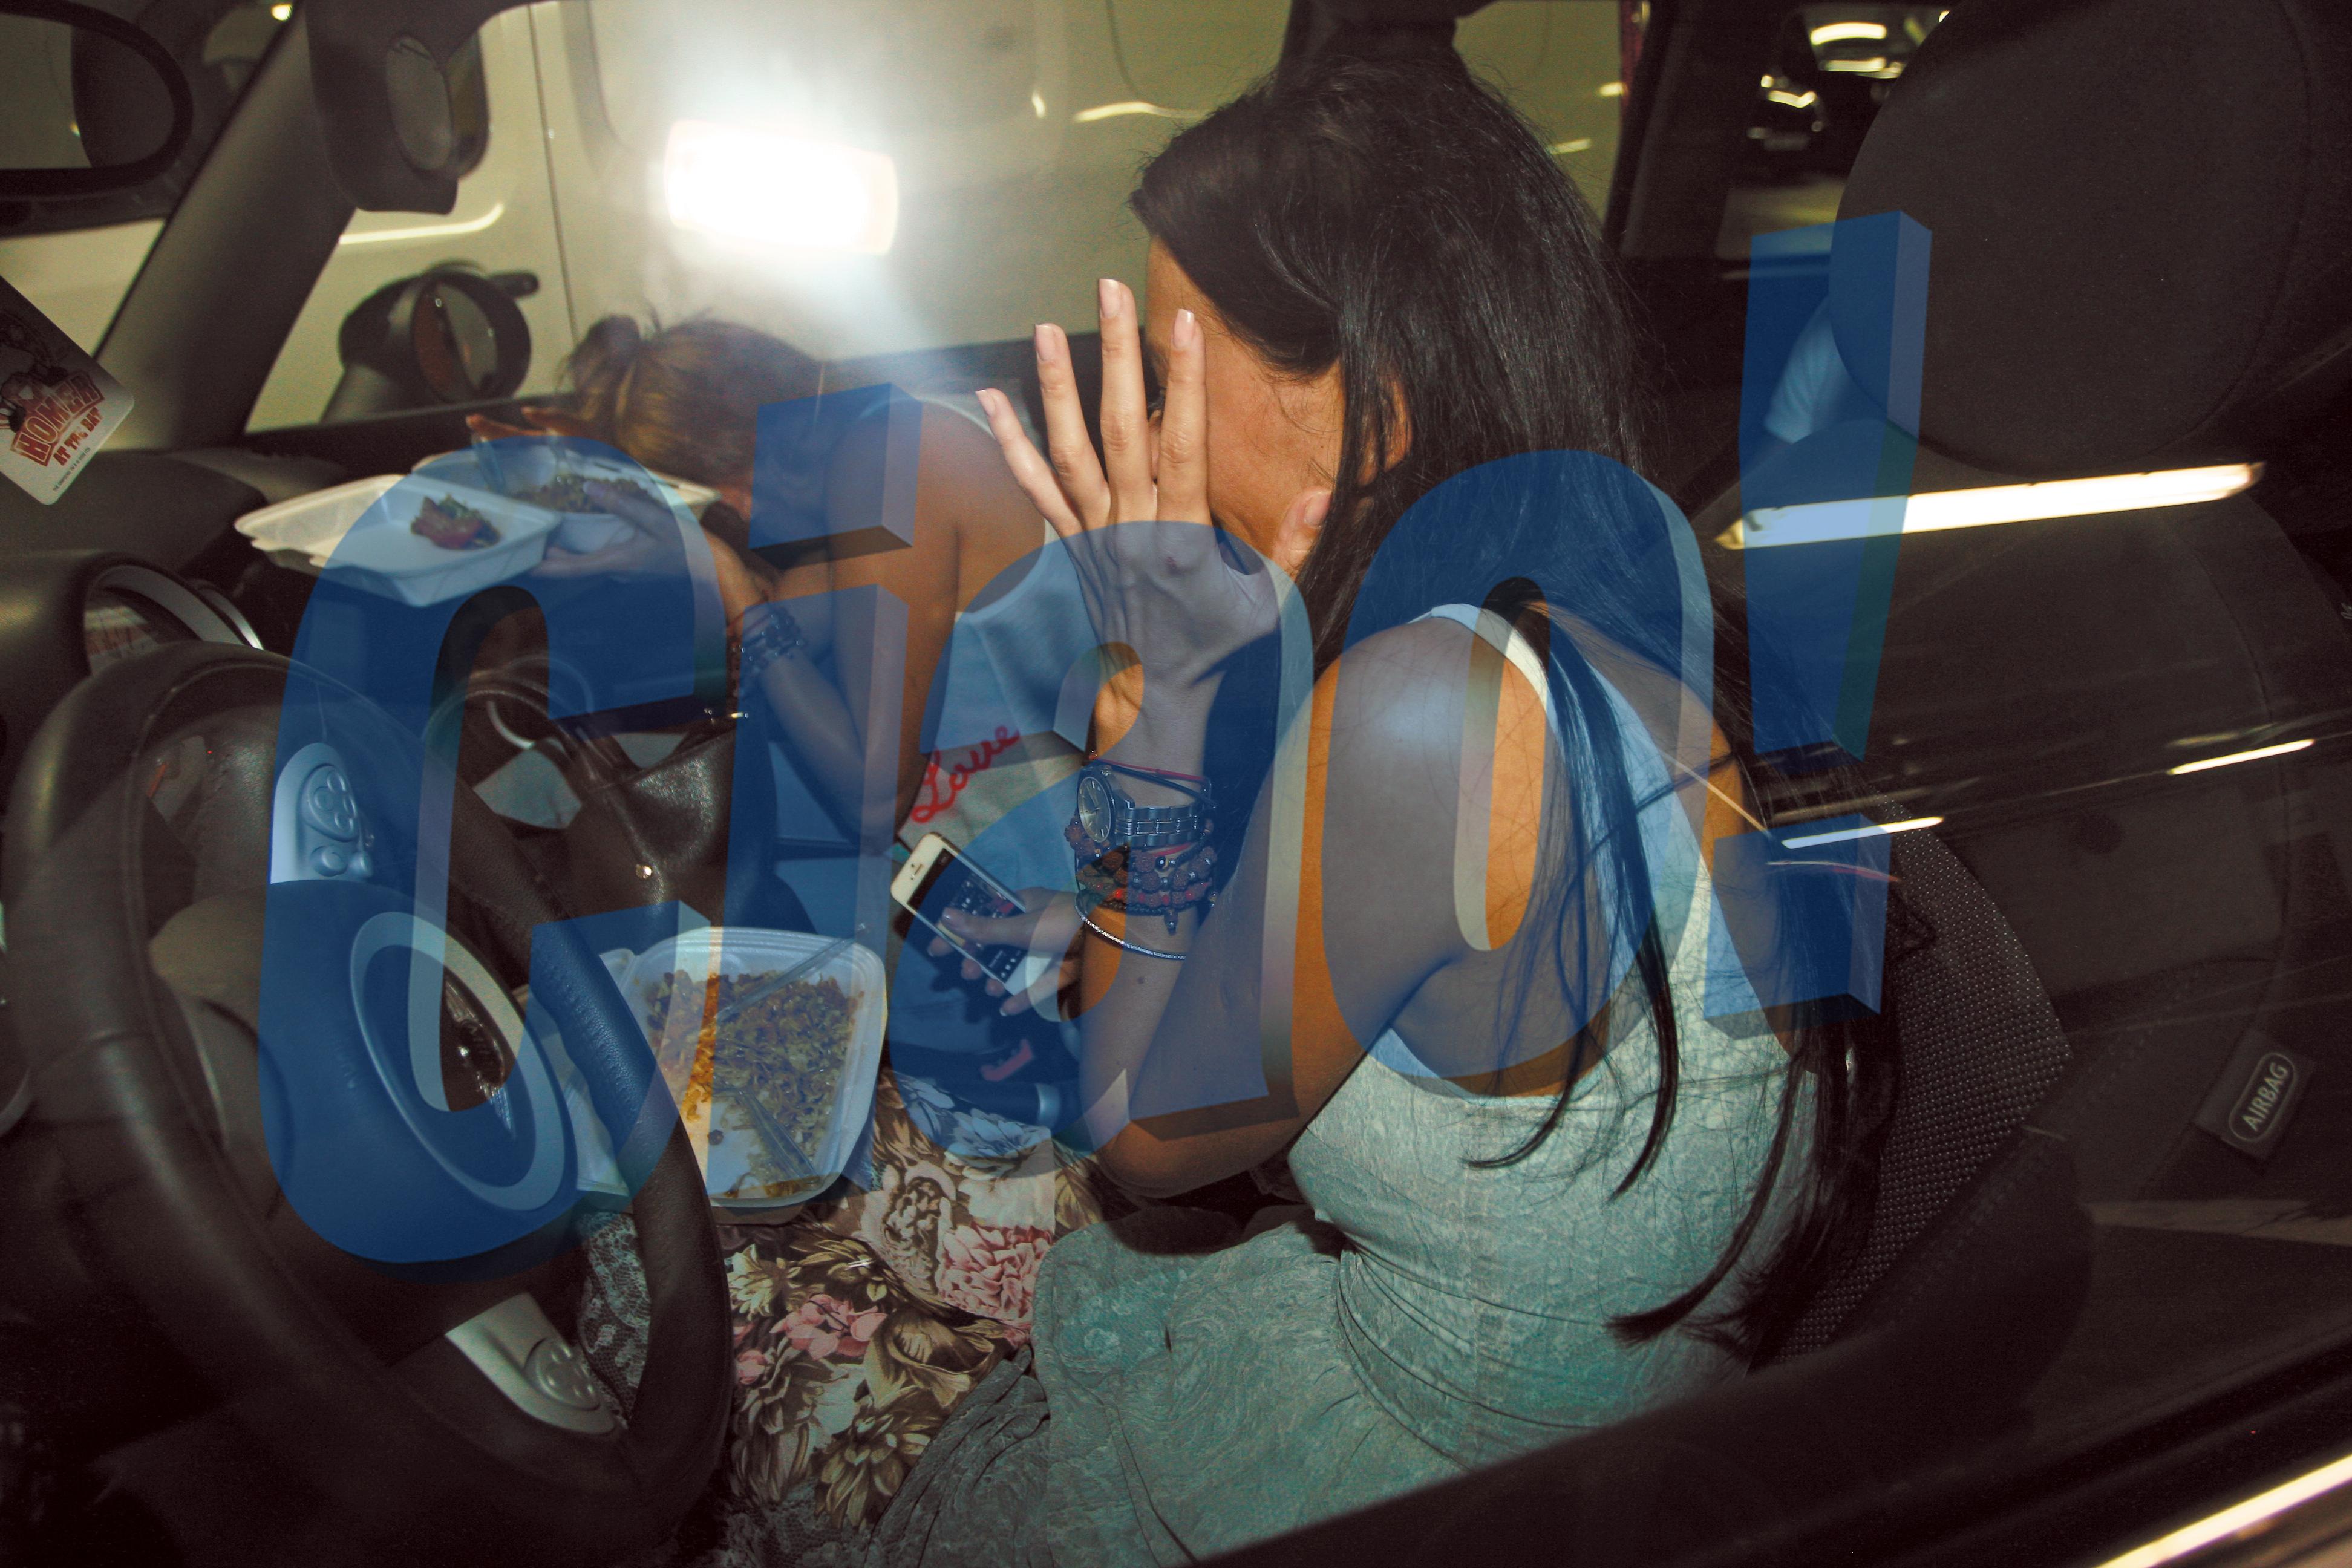 Surorile Bambi au ramas socate cand au vazut blitzurile aparatelor foto